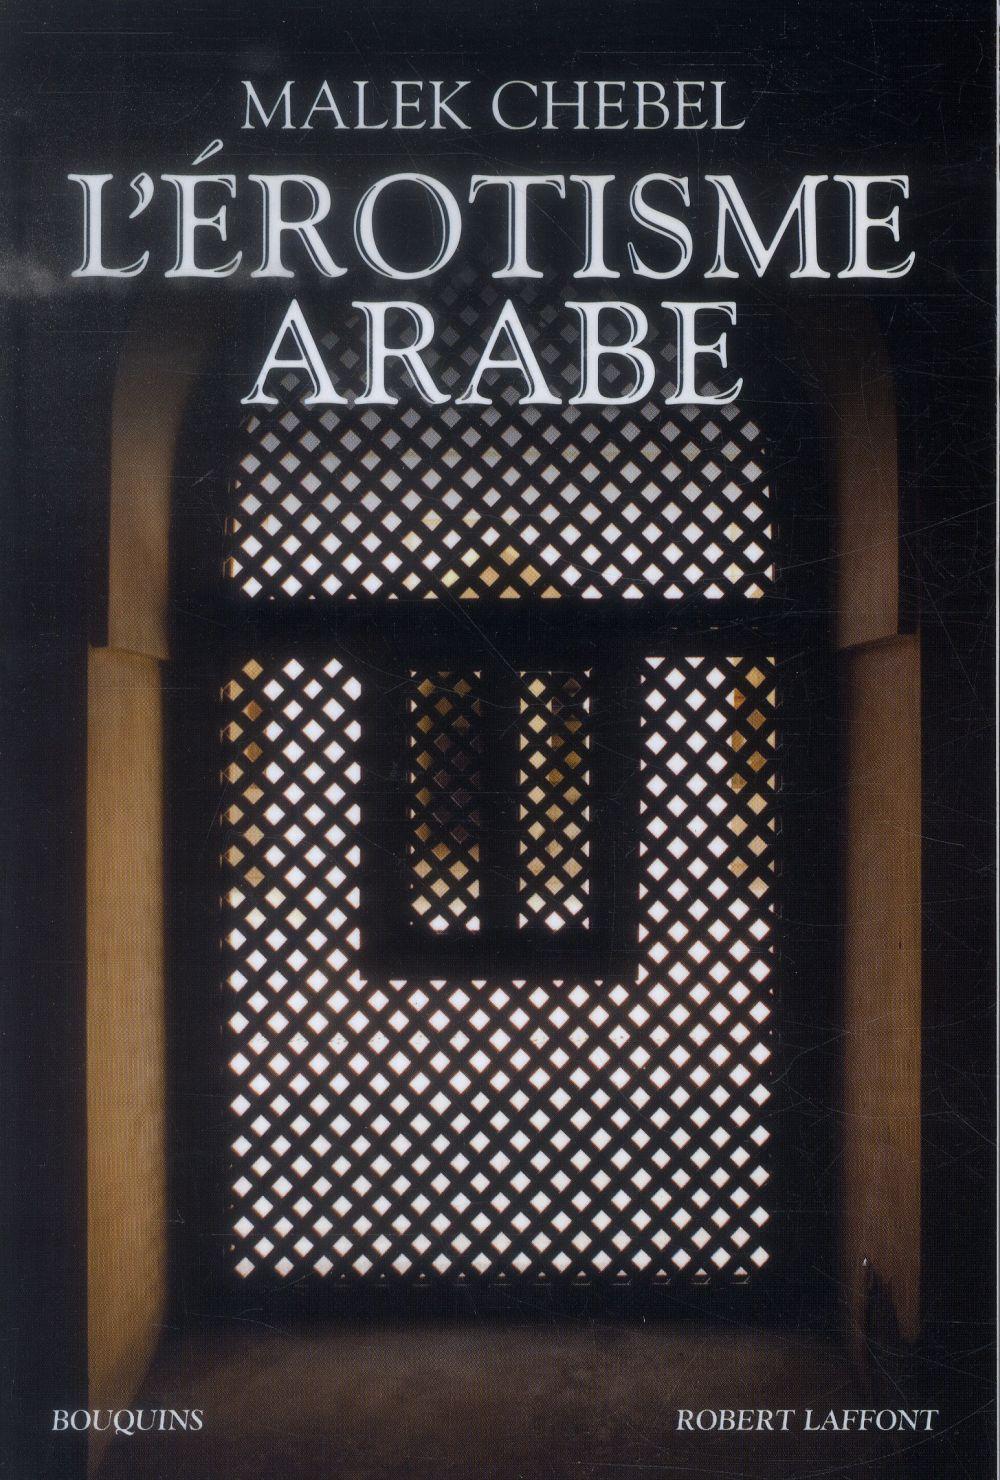 EROTISME ARABE